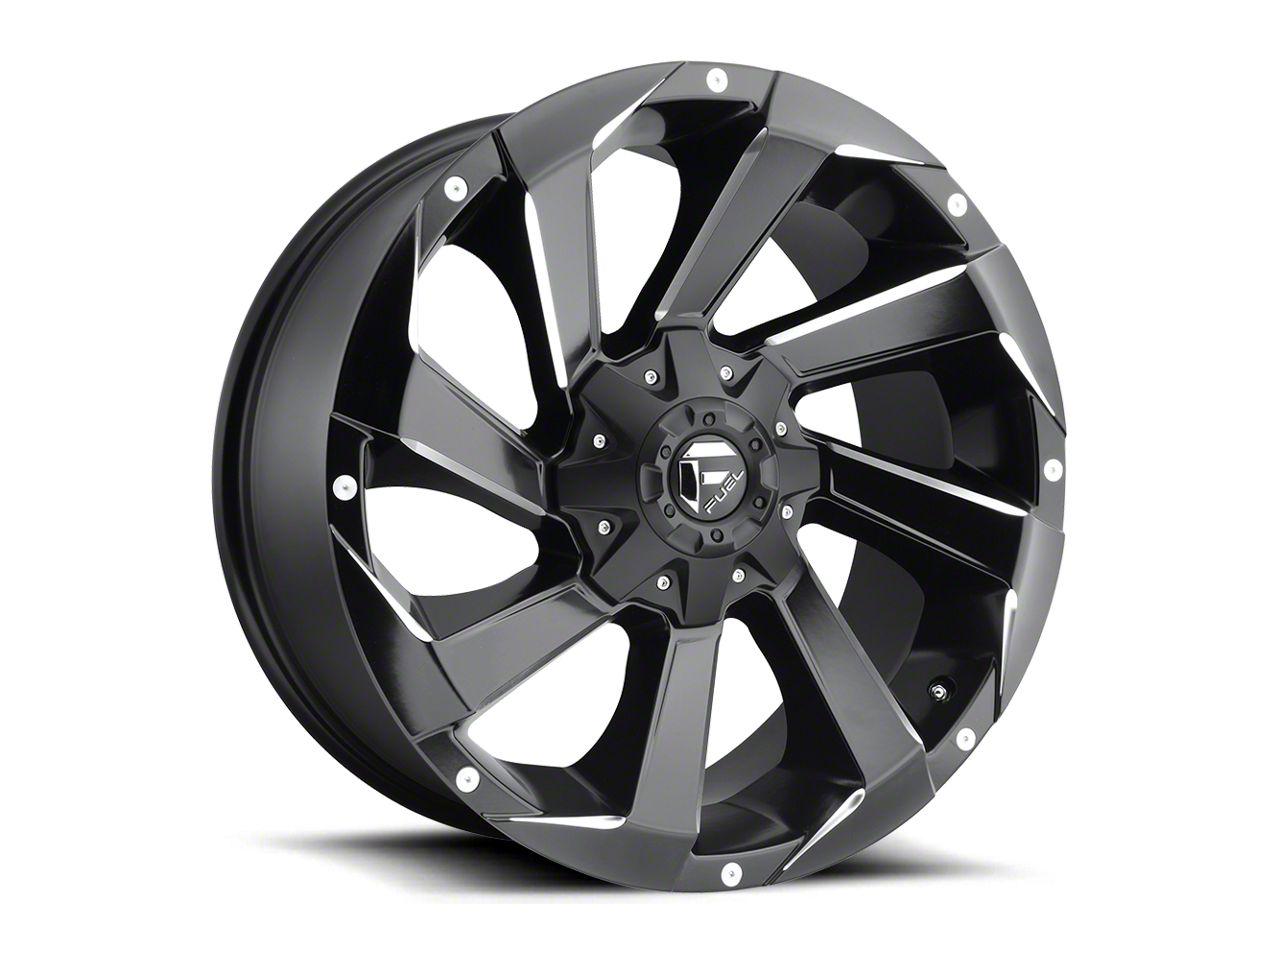 Fuel Wheels Razor Matte Black Milled 6-Lug Wheel - 20x9 (99-18 Silverado 1500)